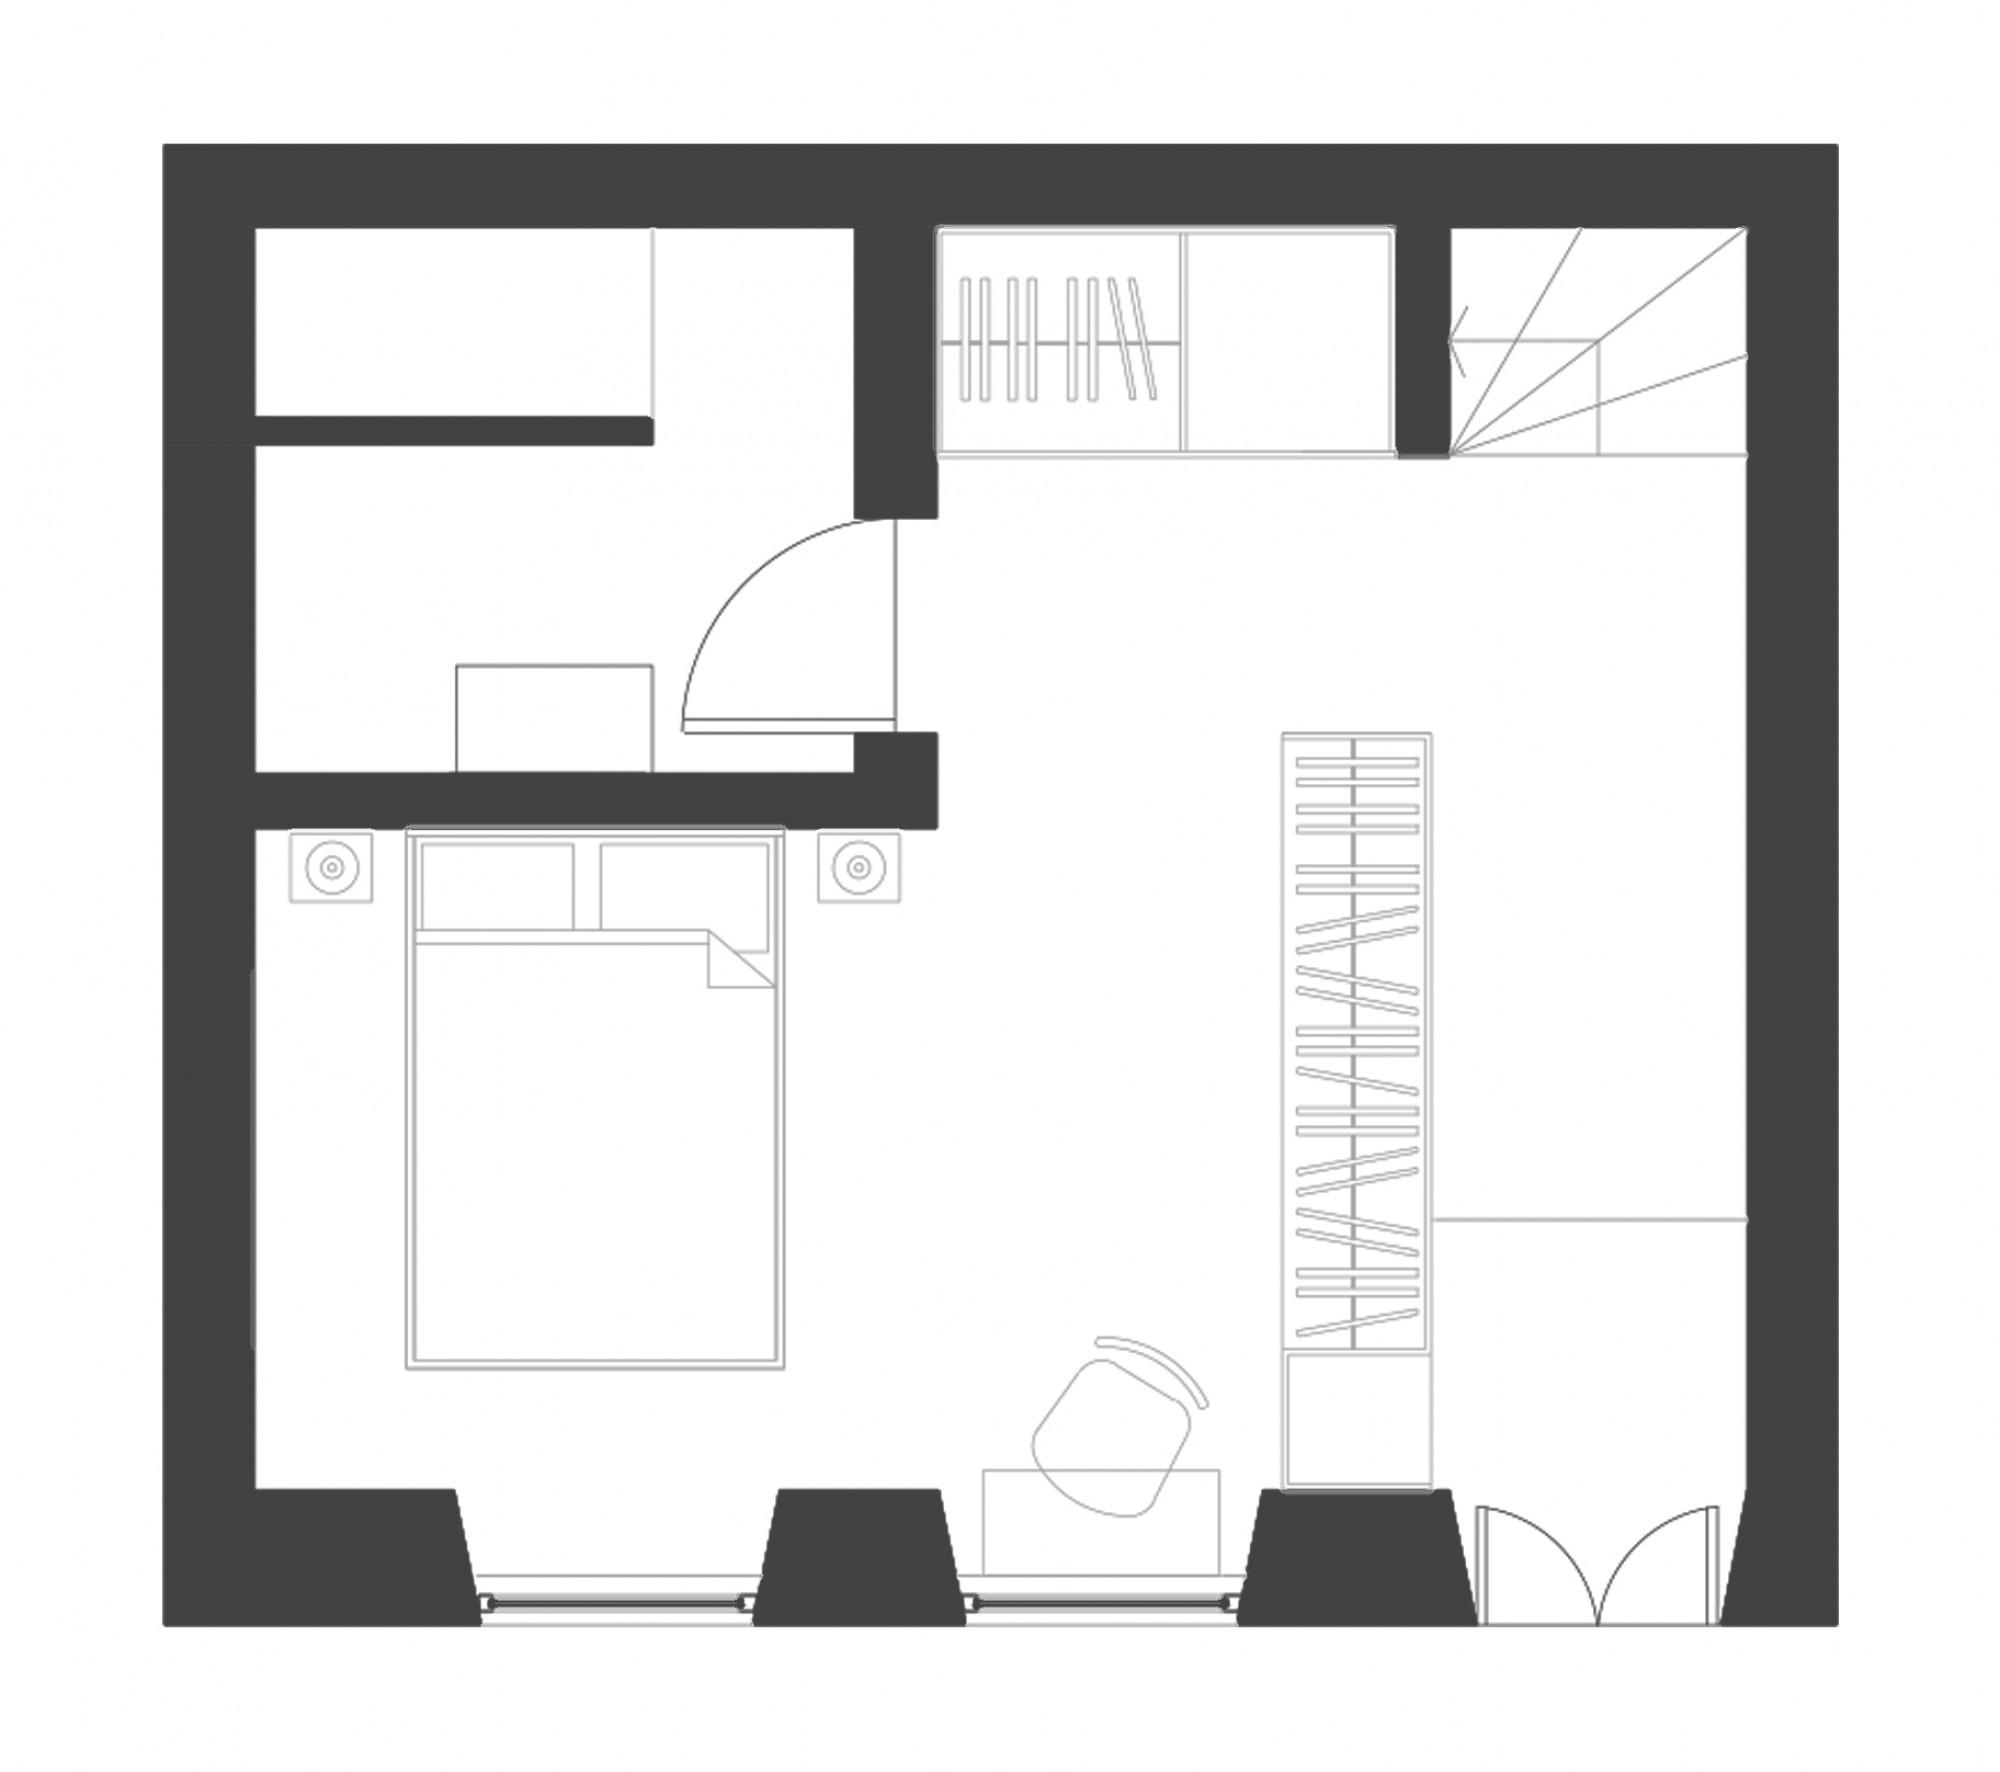 Primeiro Piso / Ground Floor